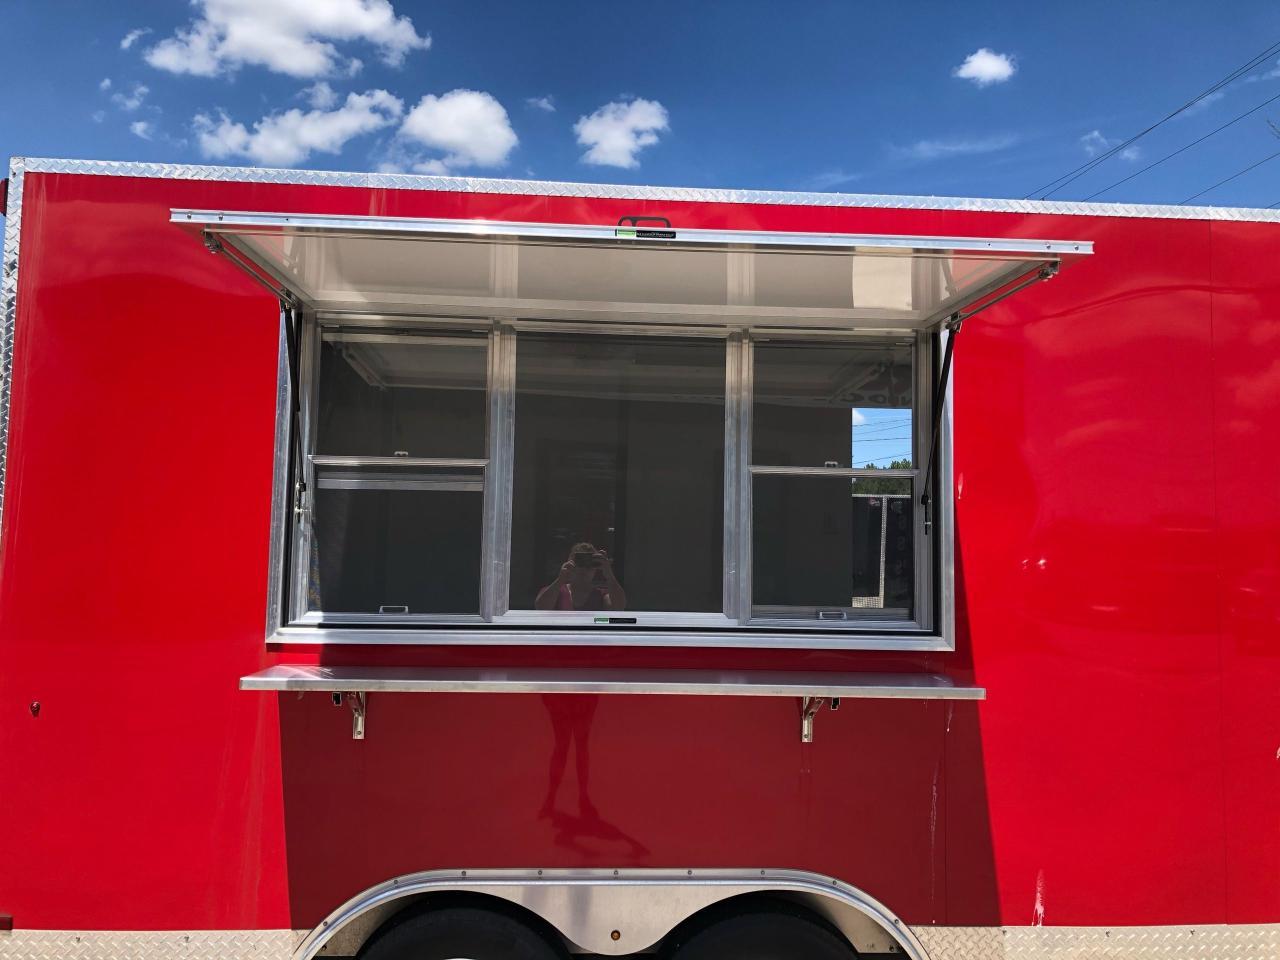 2020 Canadian Trailer Company 8.5x14 Flat Nose Cargo Trailer